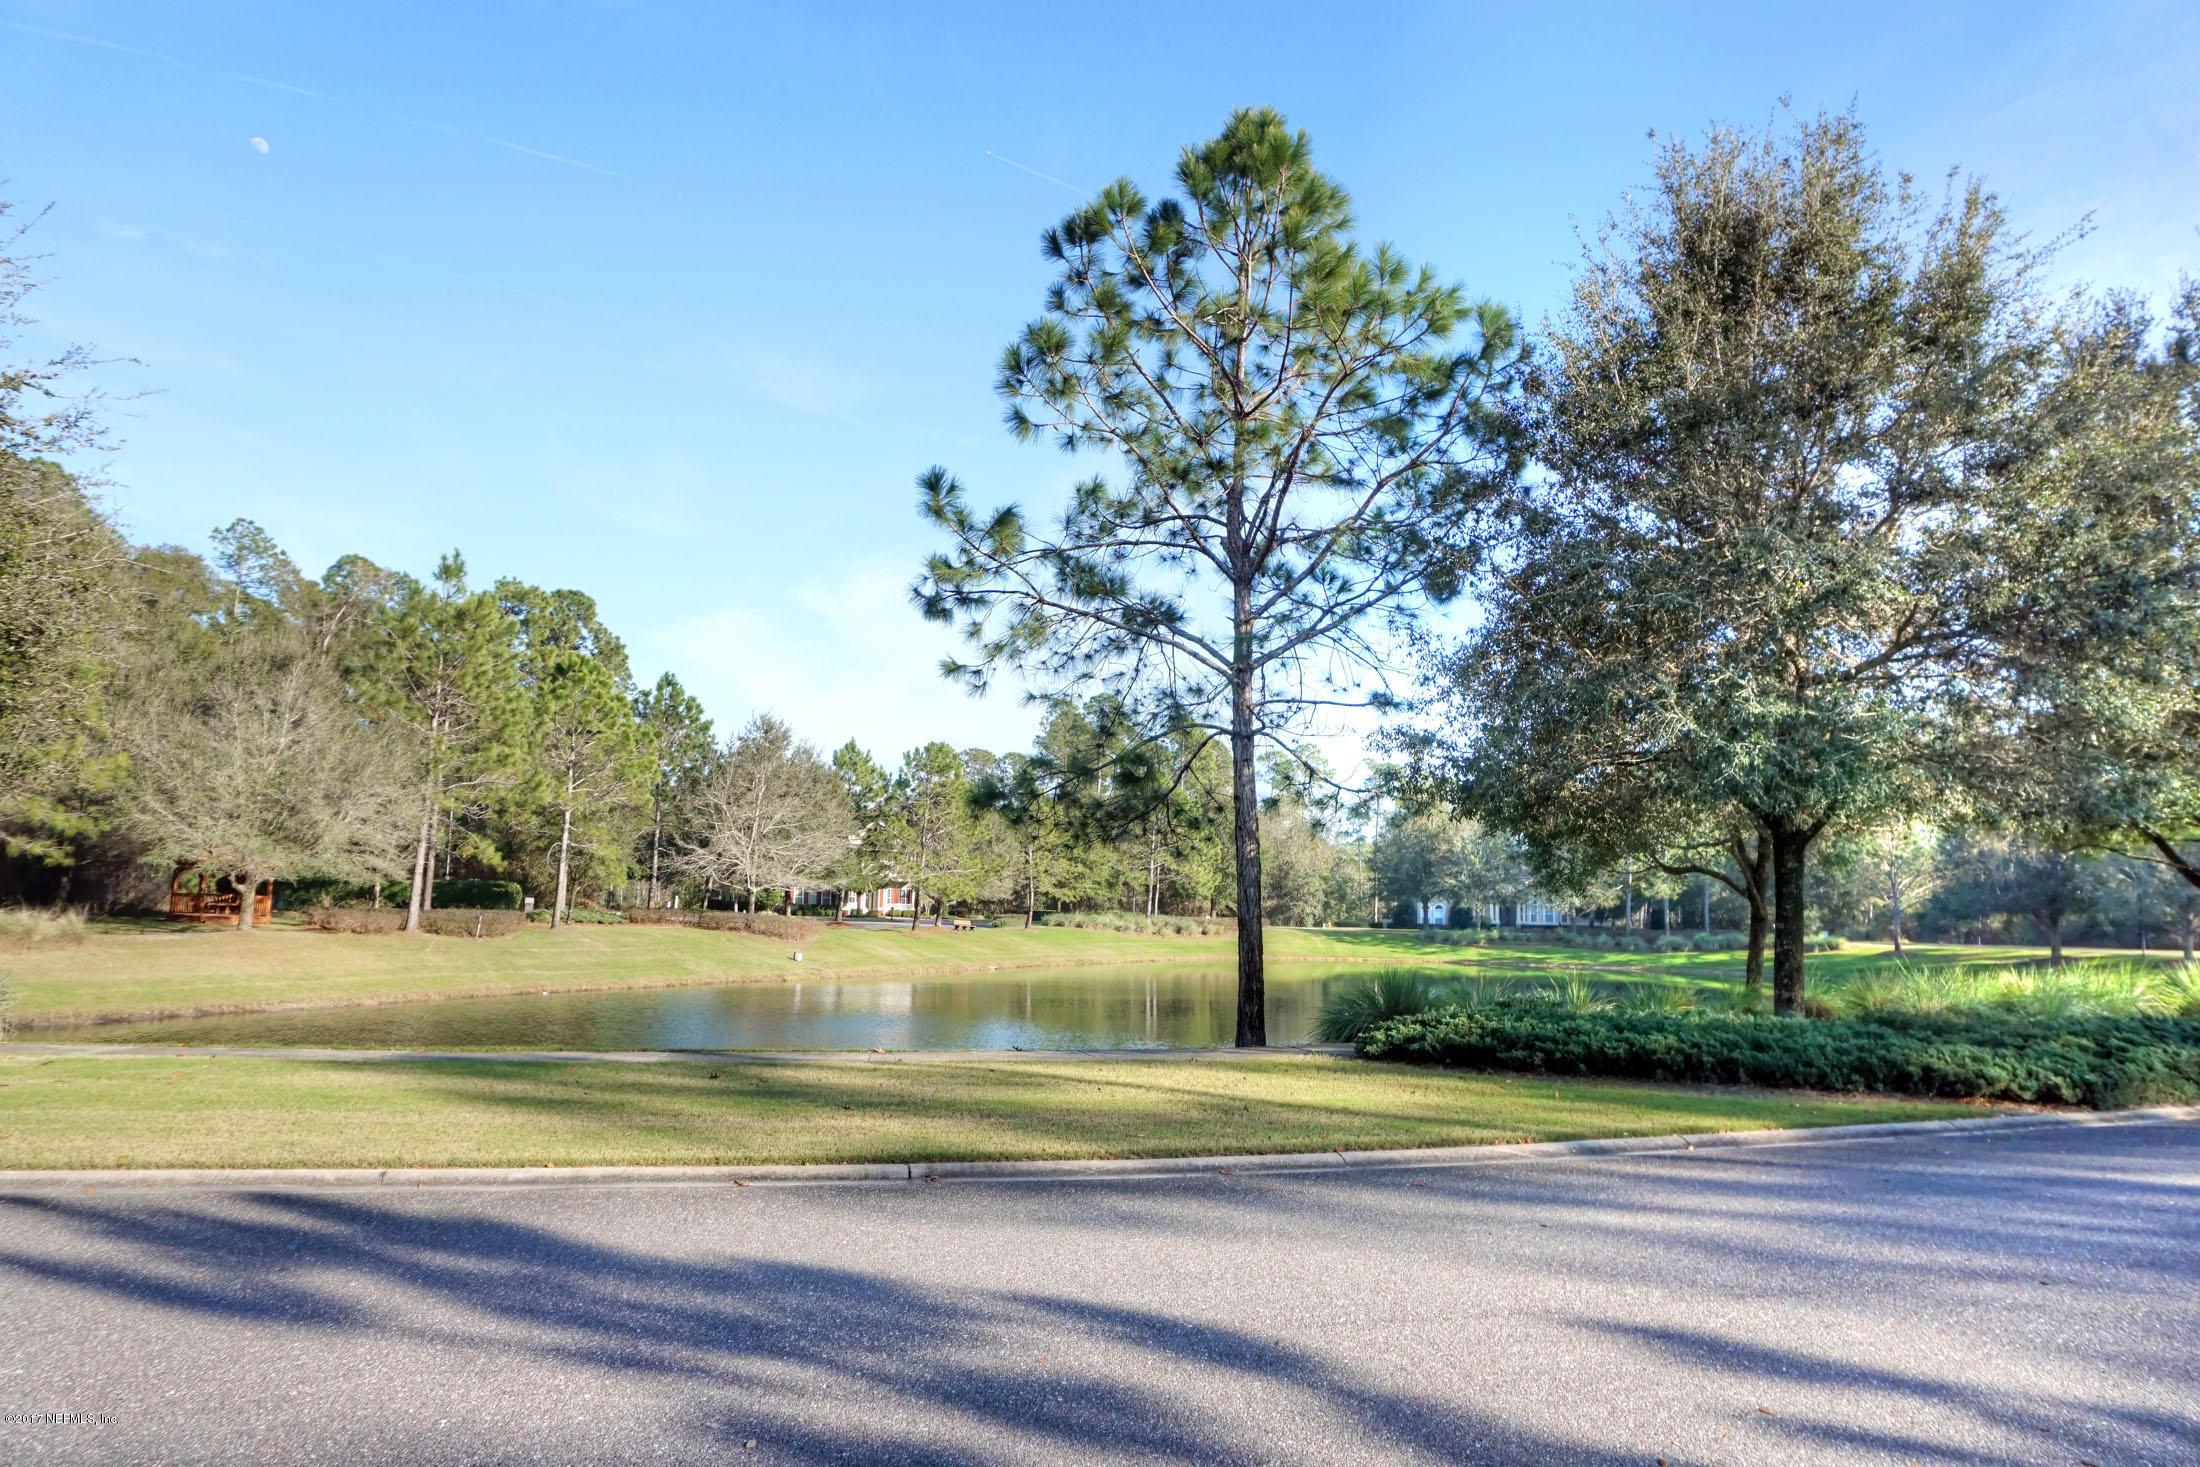 862723 HAMPTON CLUB, FERNANDINA BEACH, FLORIDA 32034, ,Vacant land,For sale,HAMPTON CLUB,867168